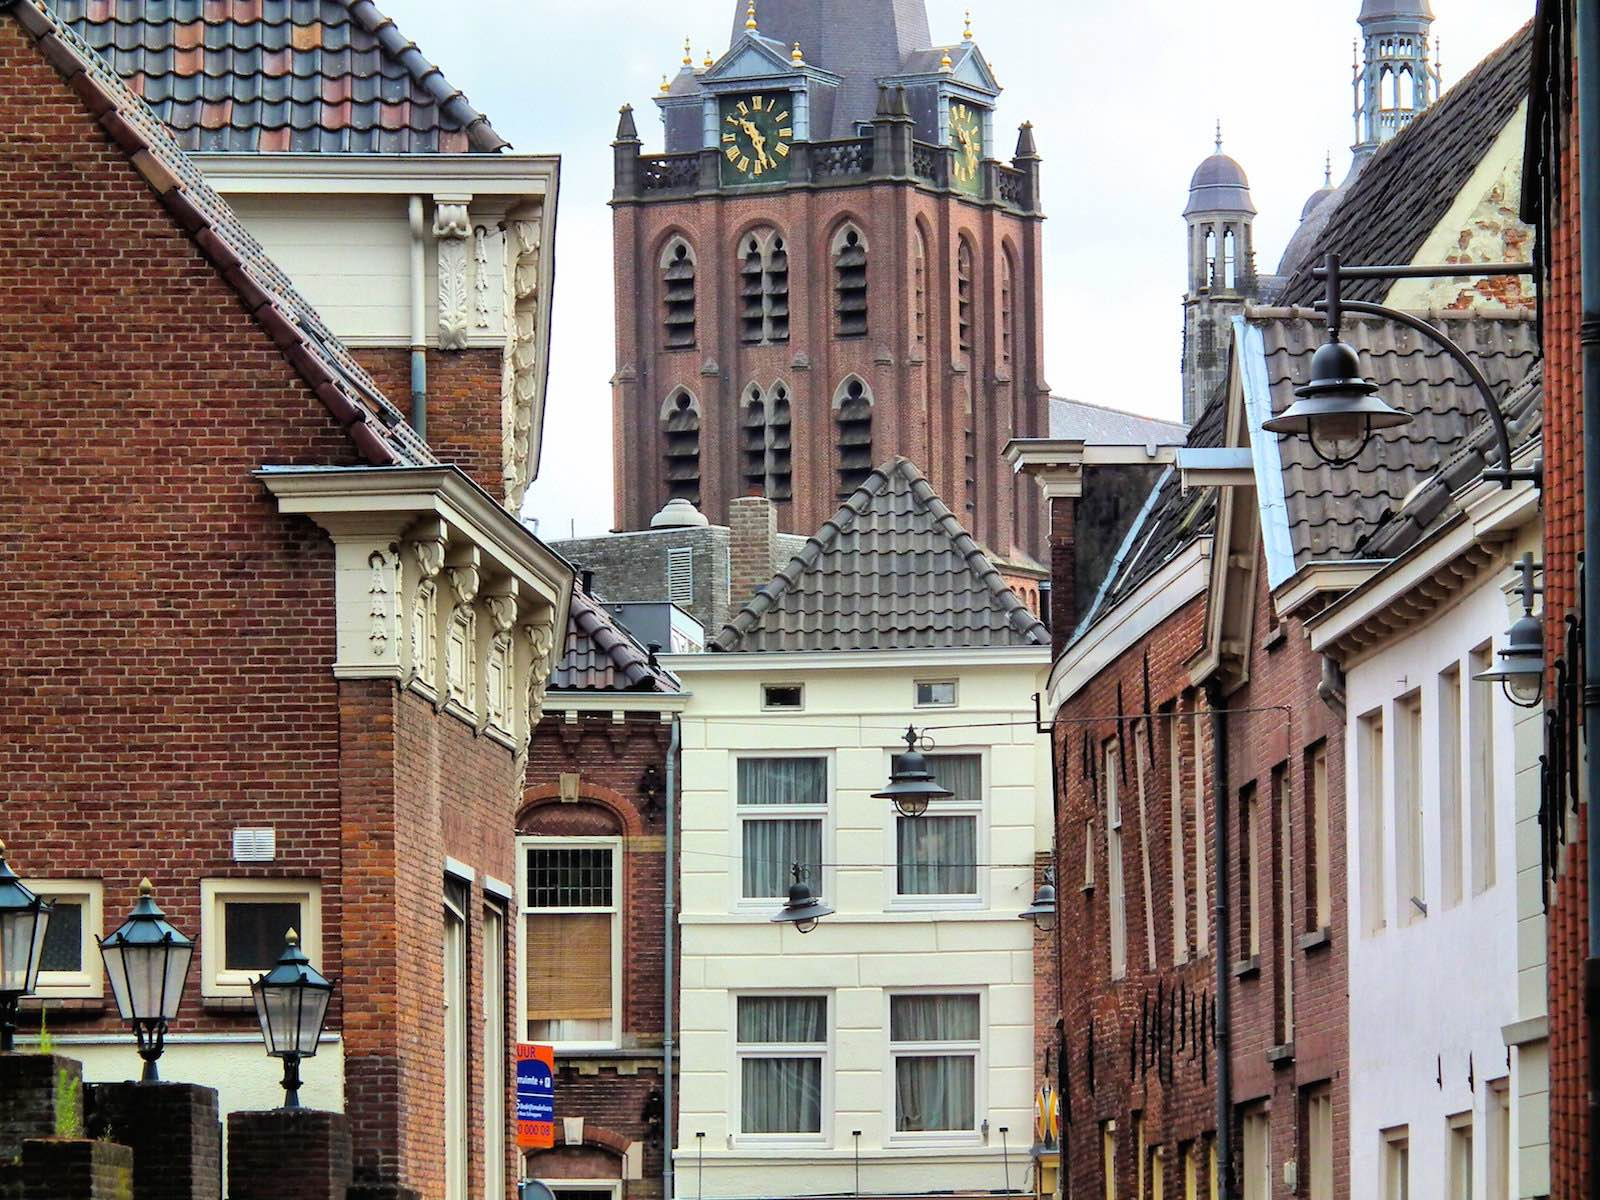 stedentrip Den Bosch